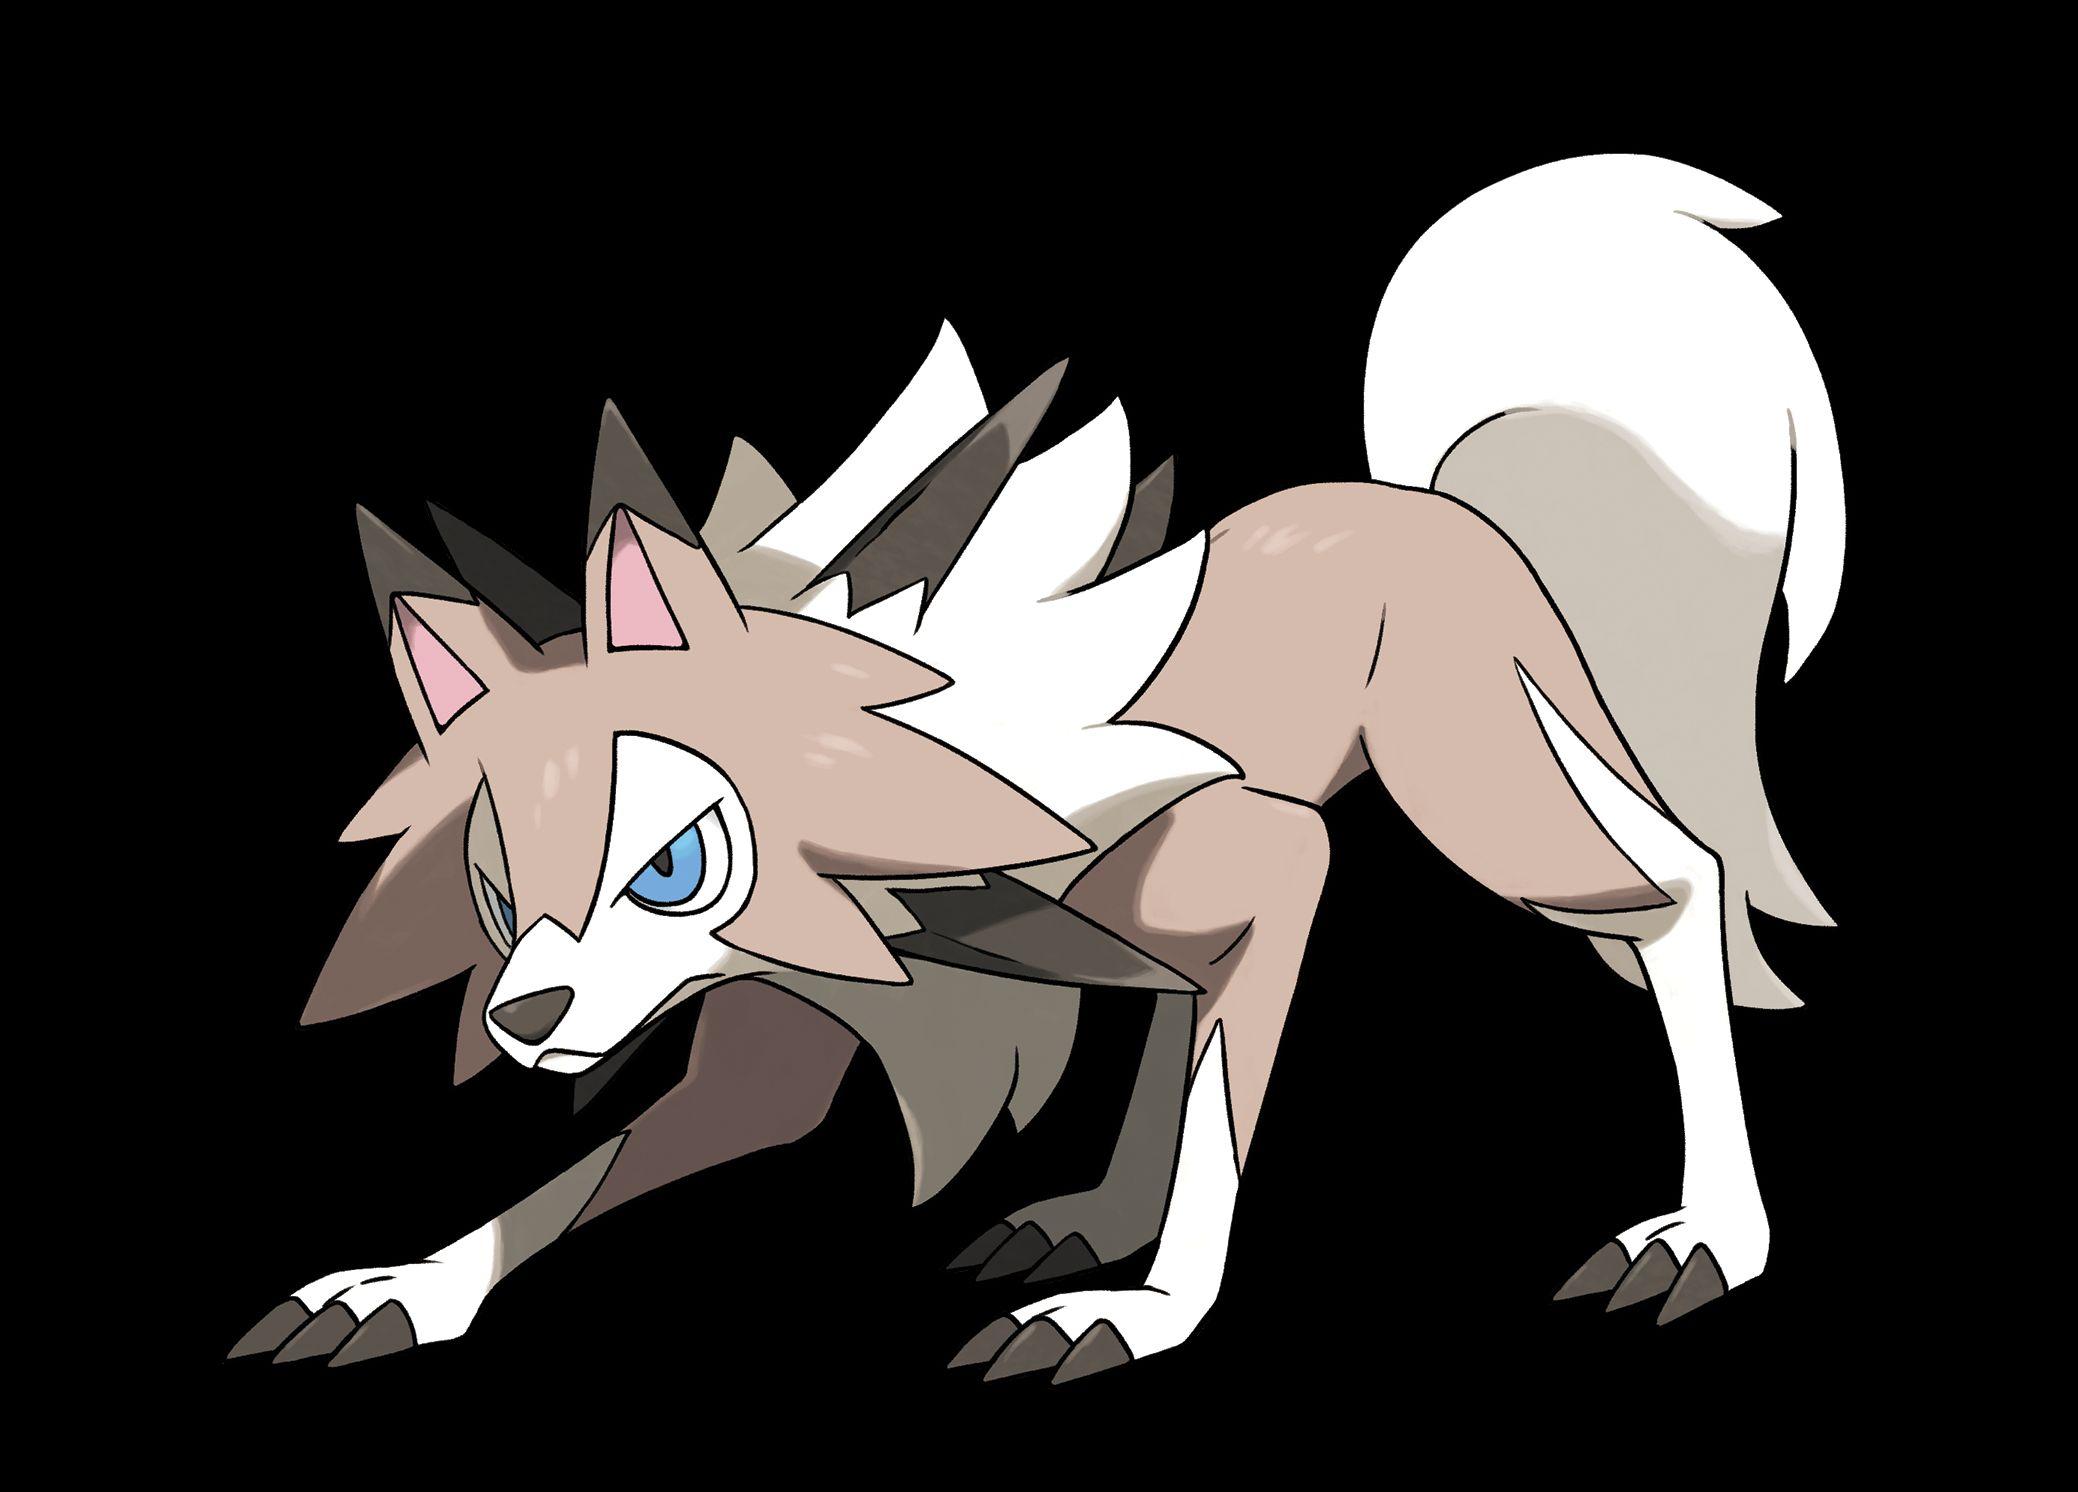 Pokémon Sole e Luna: ecco due nuove Ultra Bestie